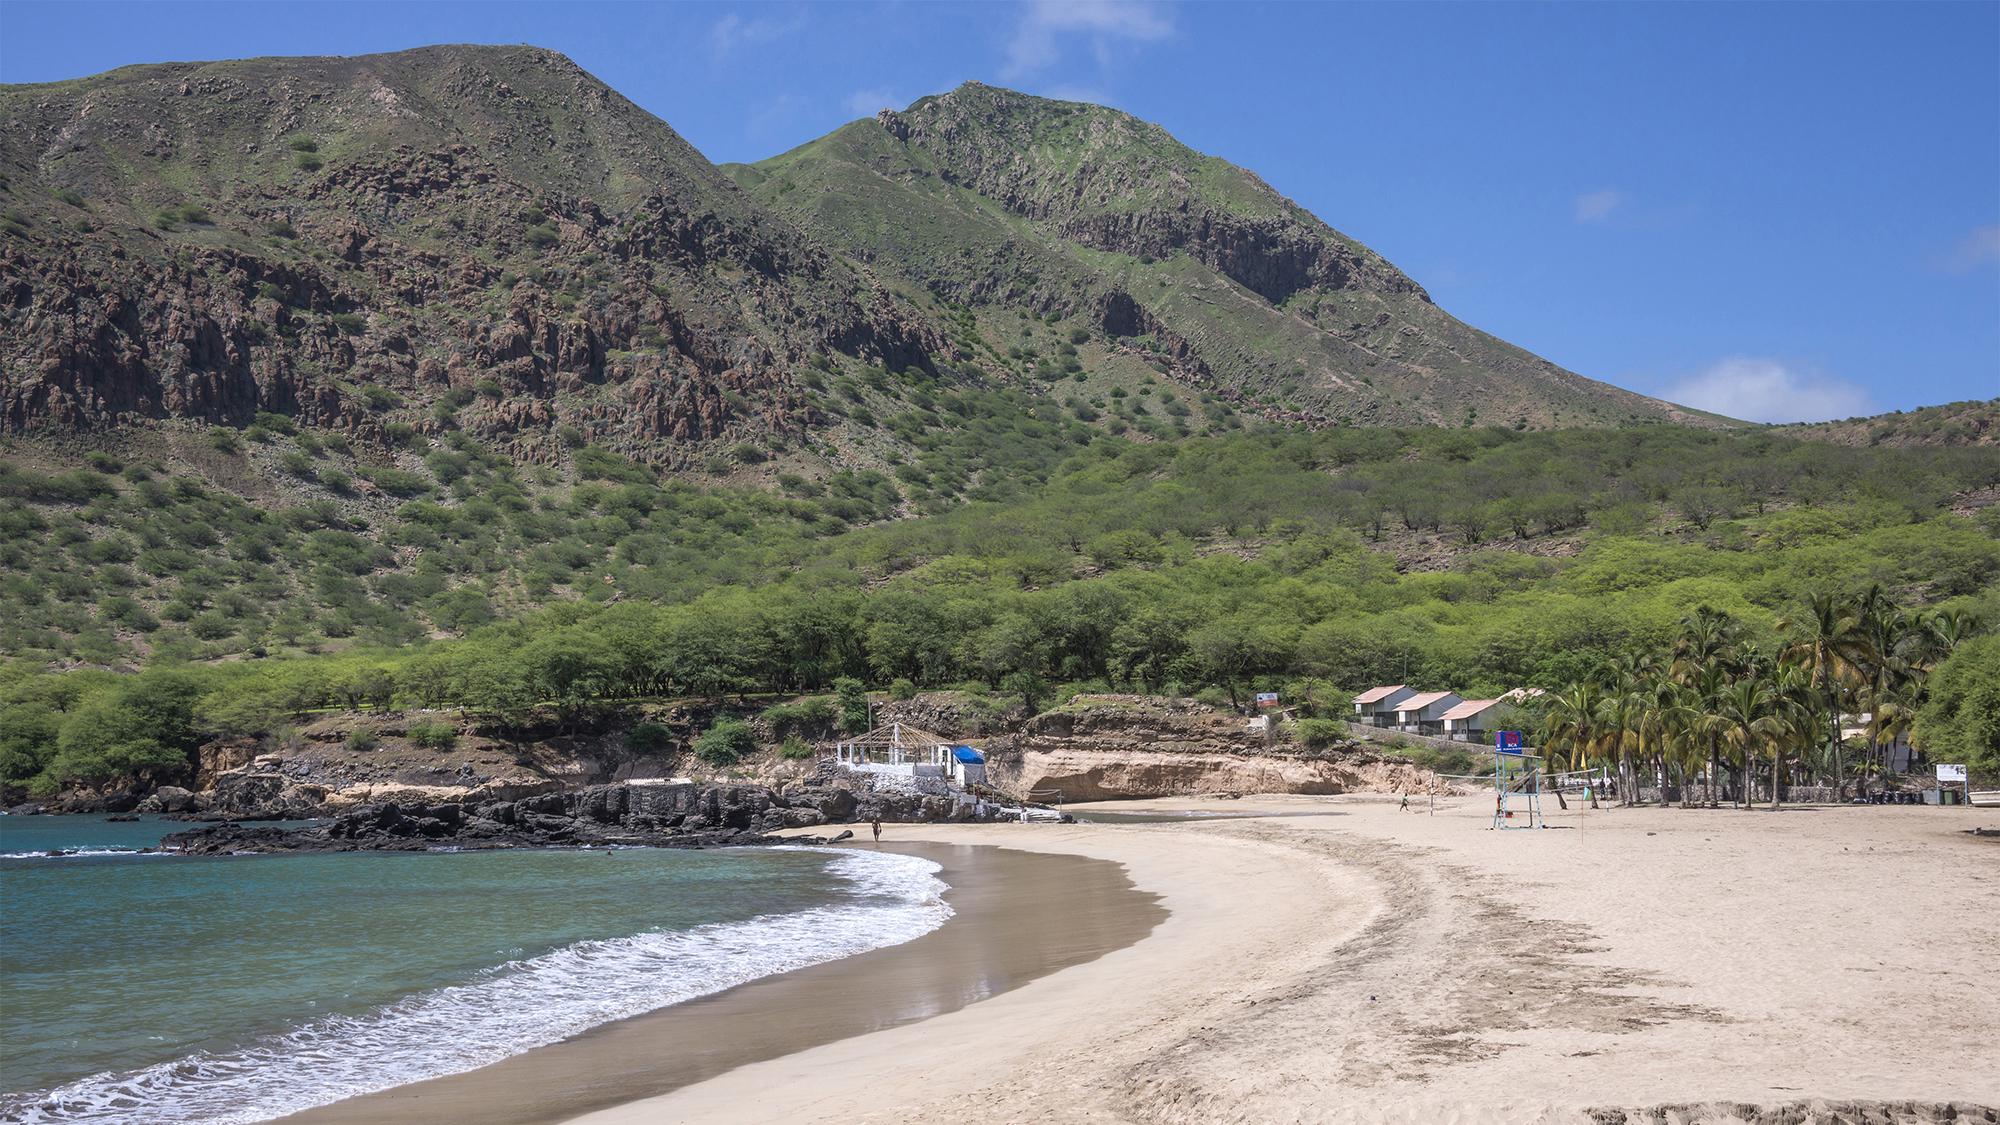 Cape Verde Islands, Overflowing With Activities: Travel Weekly